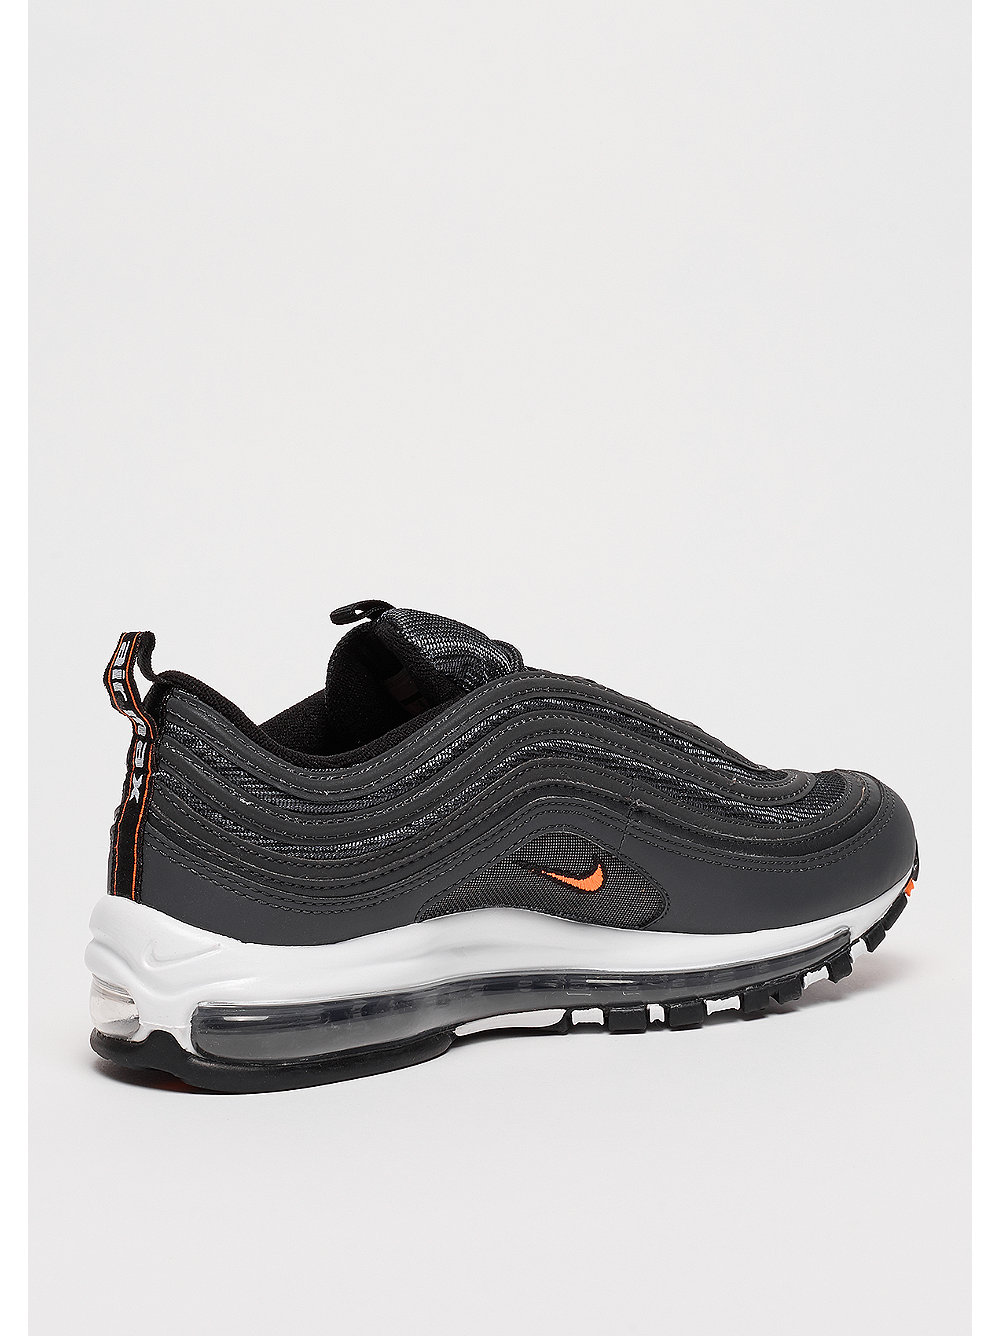 snipes sale sneaker